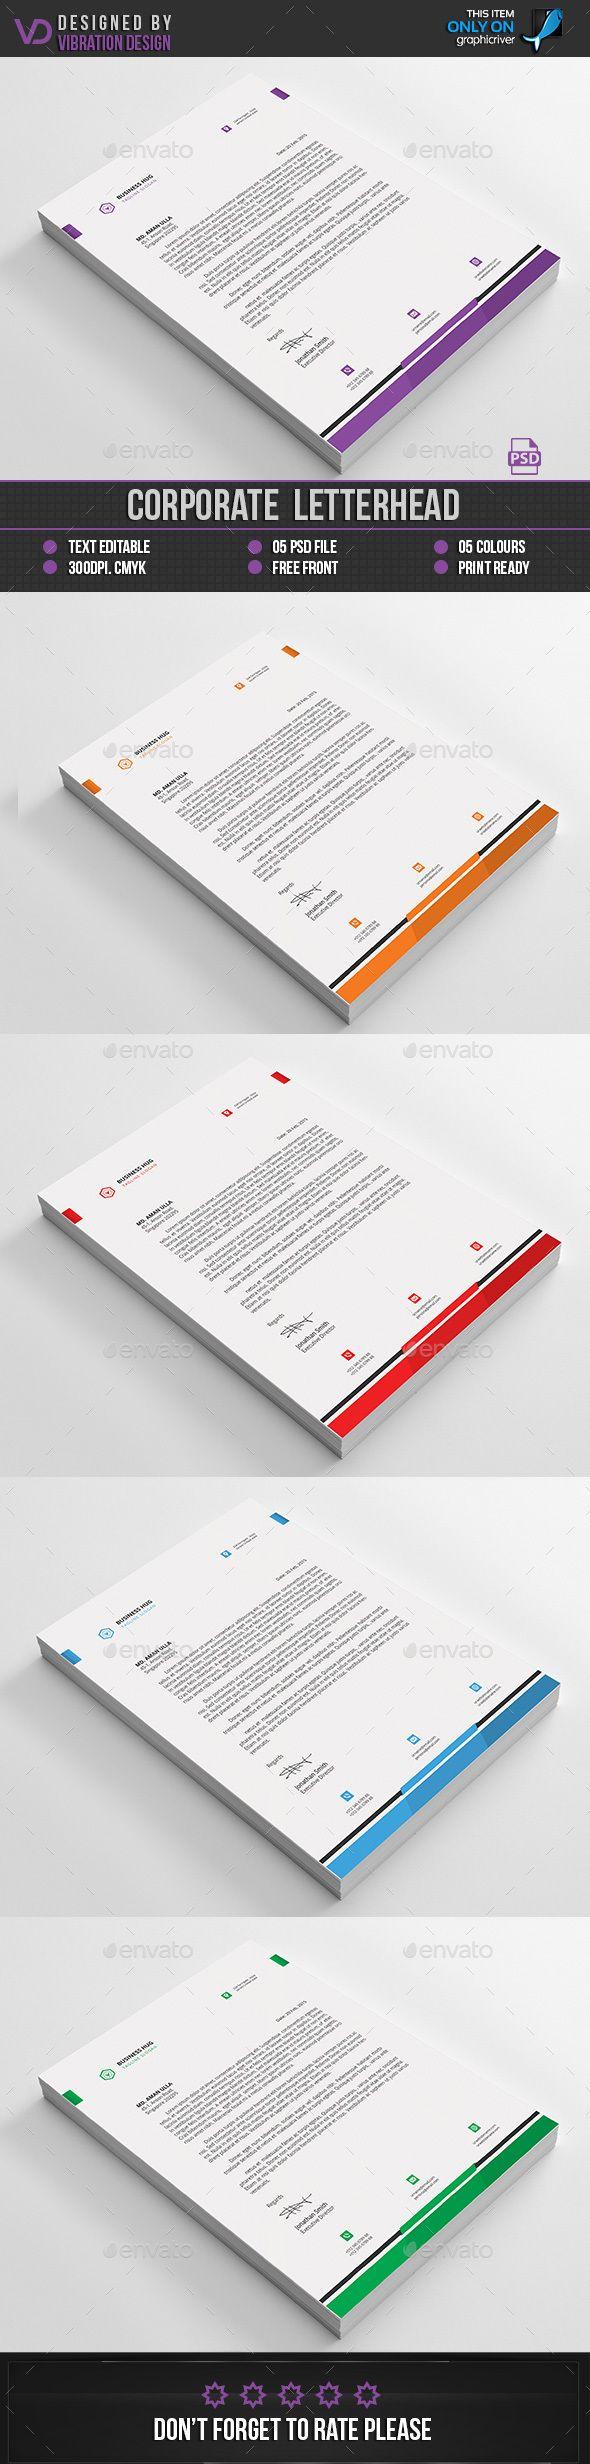 Buy Corporate Letterhead by kawsarnshimo on GraphicRiver